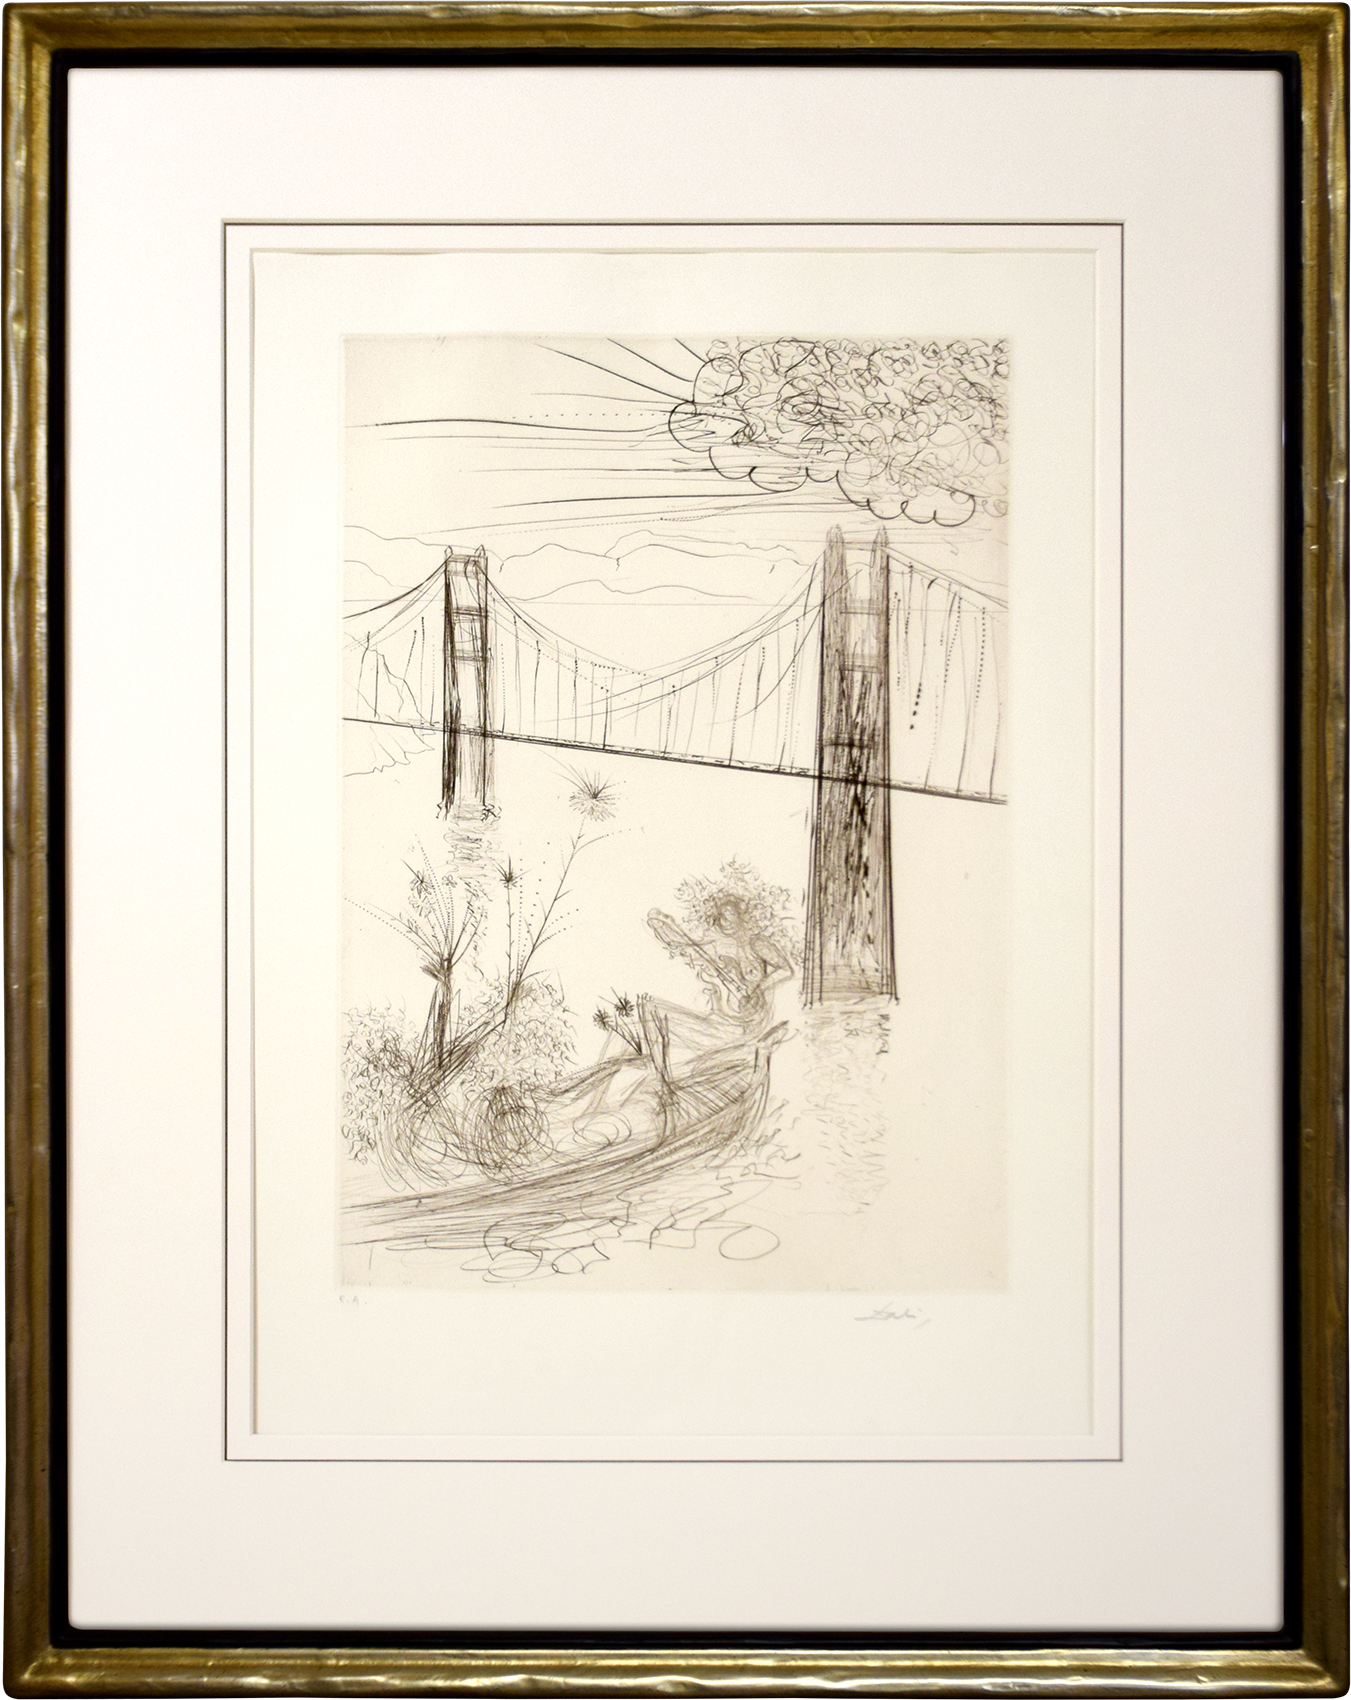 Salvador Dalí - Golden Gate Bridge , 0611-008-532